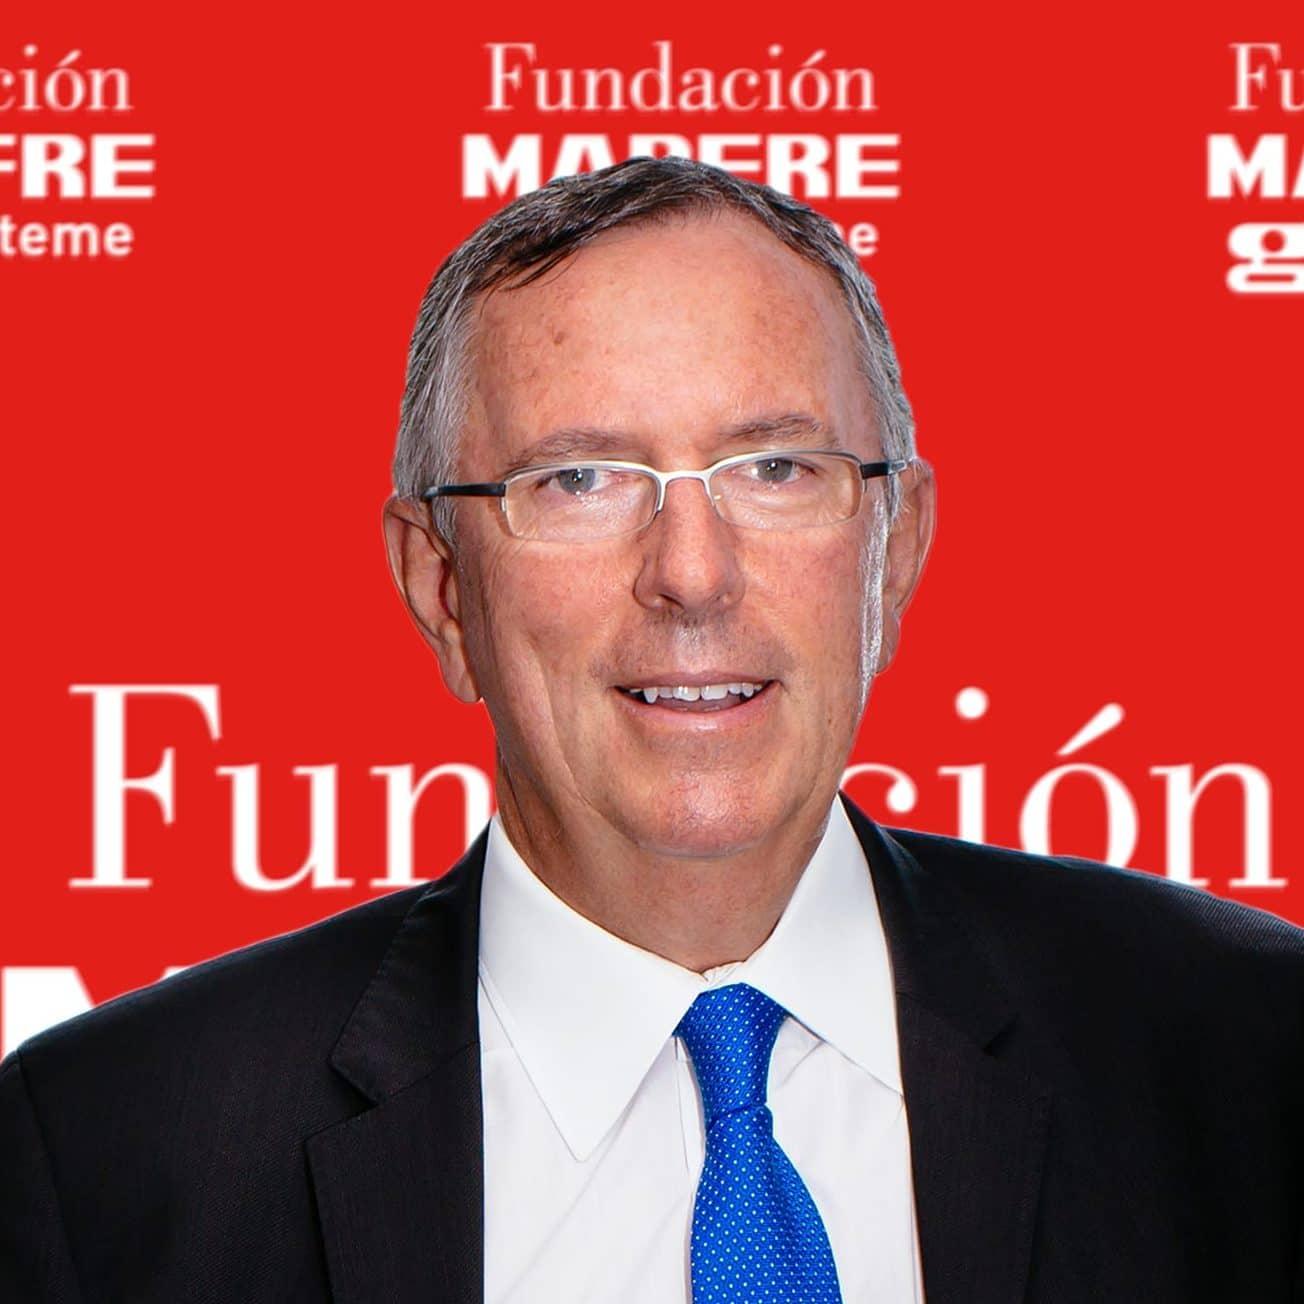 Jorge Carlos Petit Sánchez